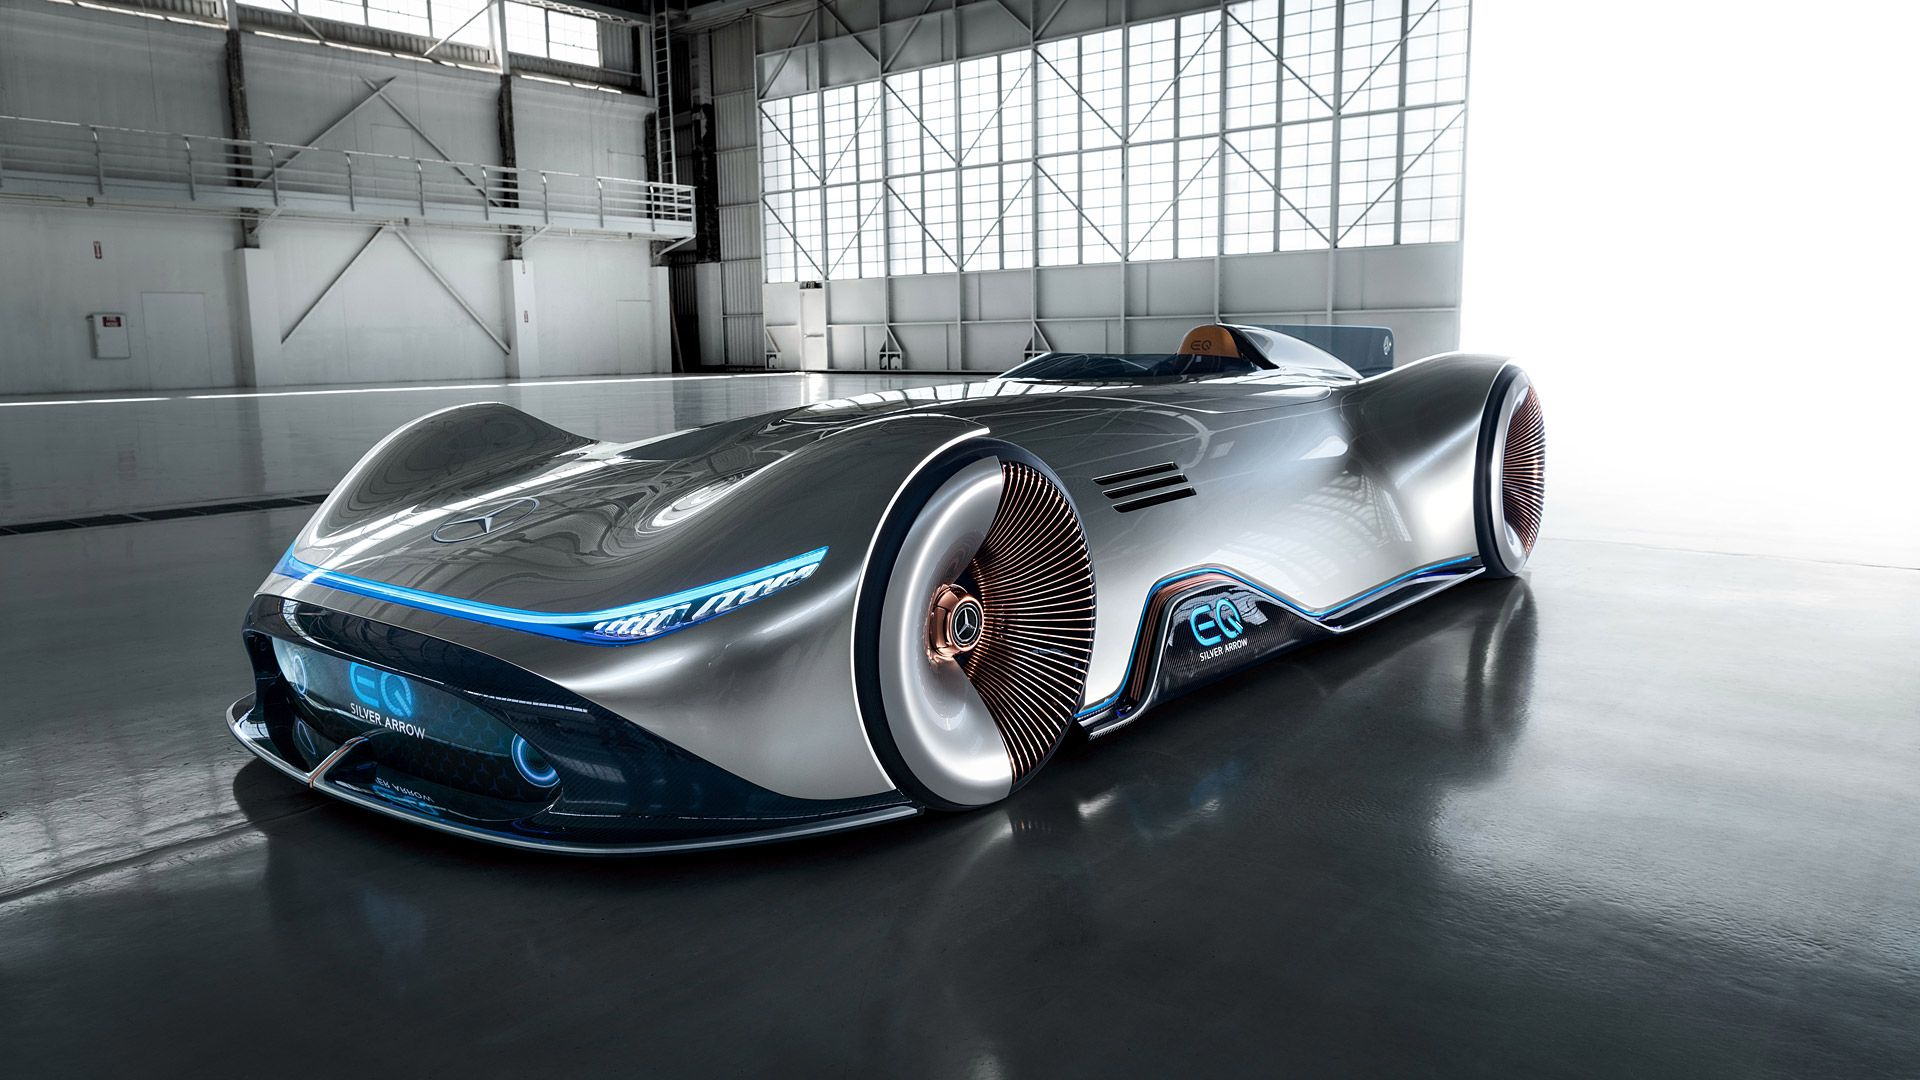 2018 Mercedes Benz Vision Eq Silver Arrow Concept Future Concept Cars Mercedes Maybach Mercedes Benz